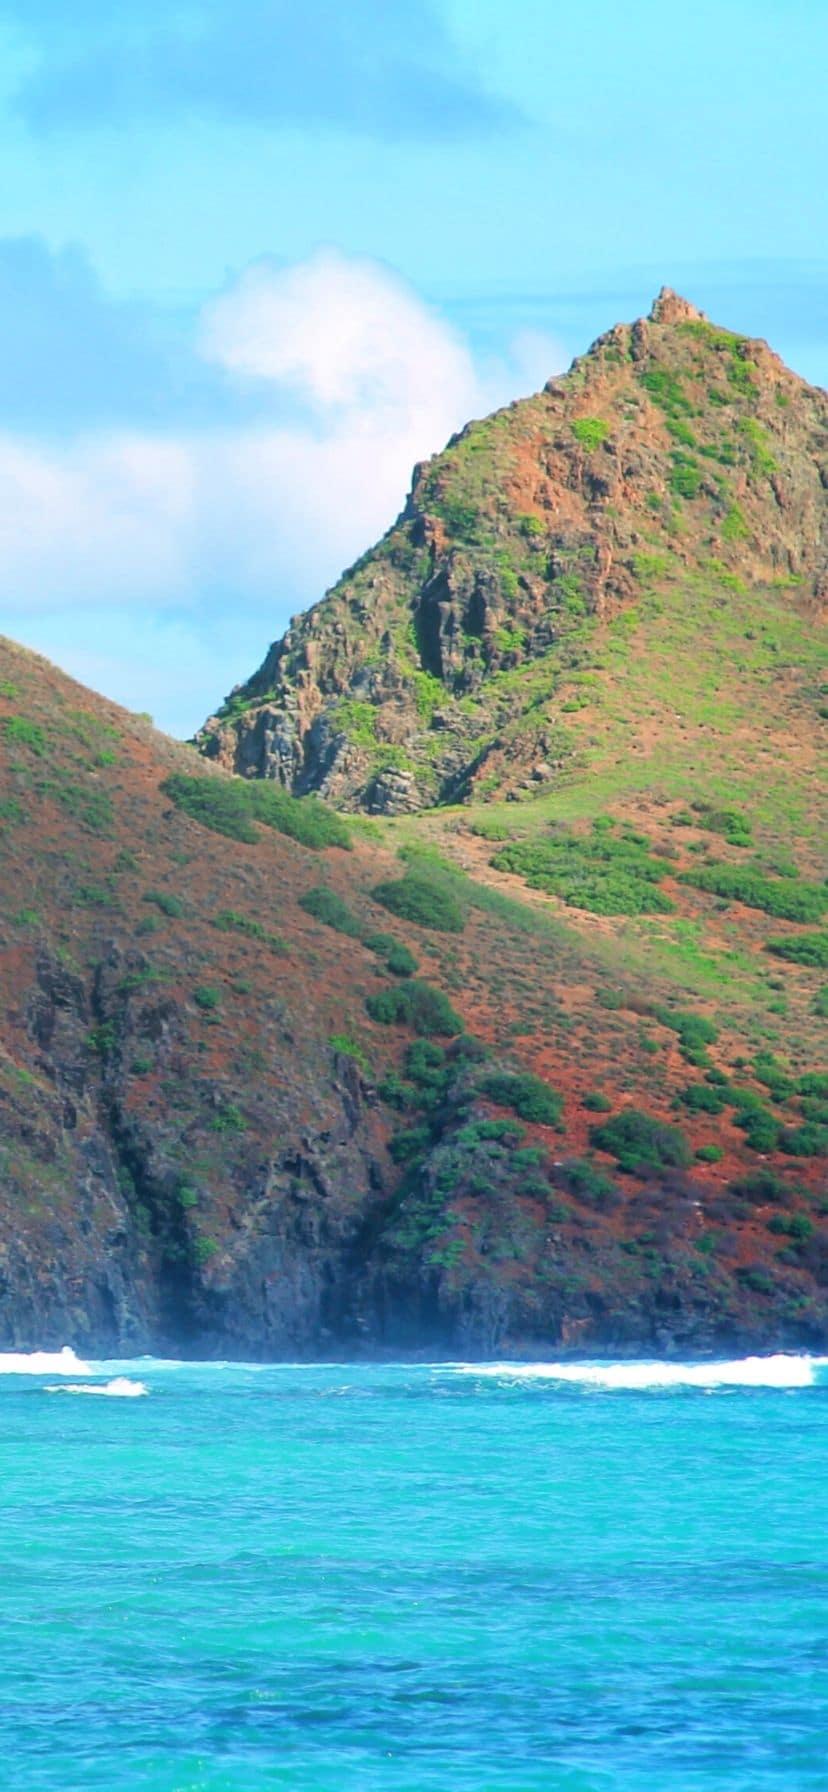 Green lush island off Lanikai, Oahu Eastern Shore